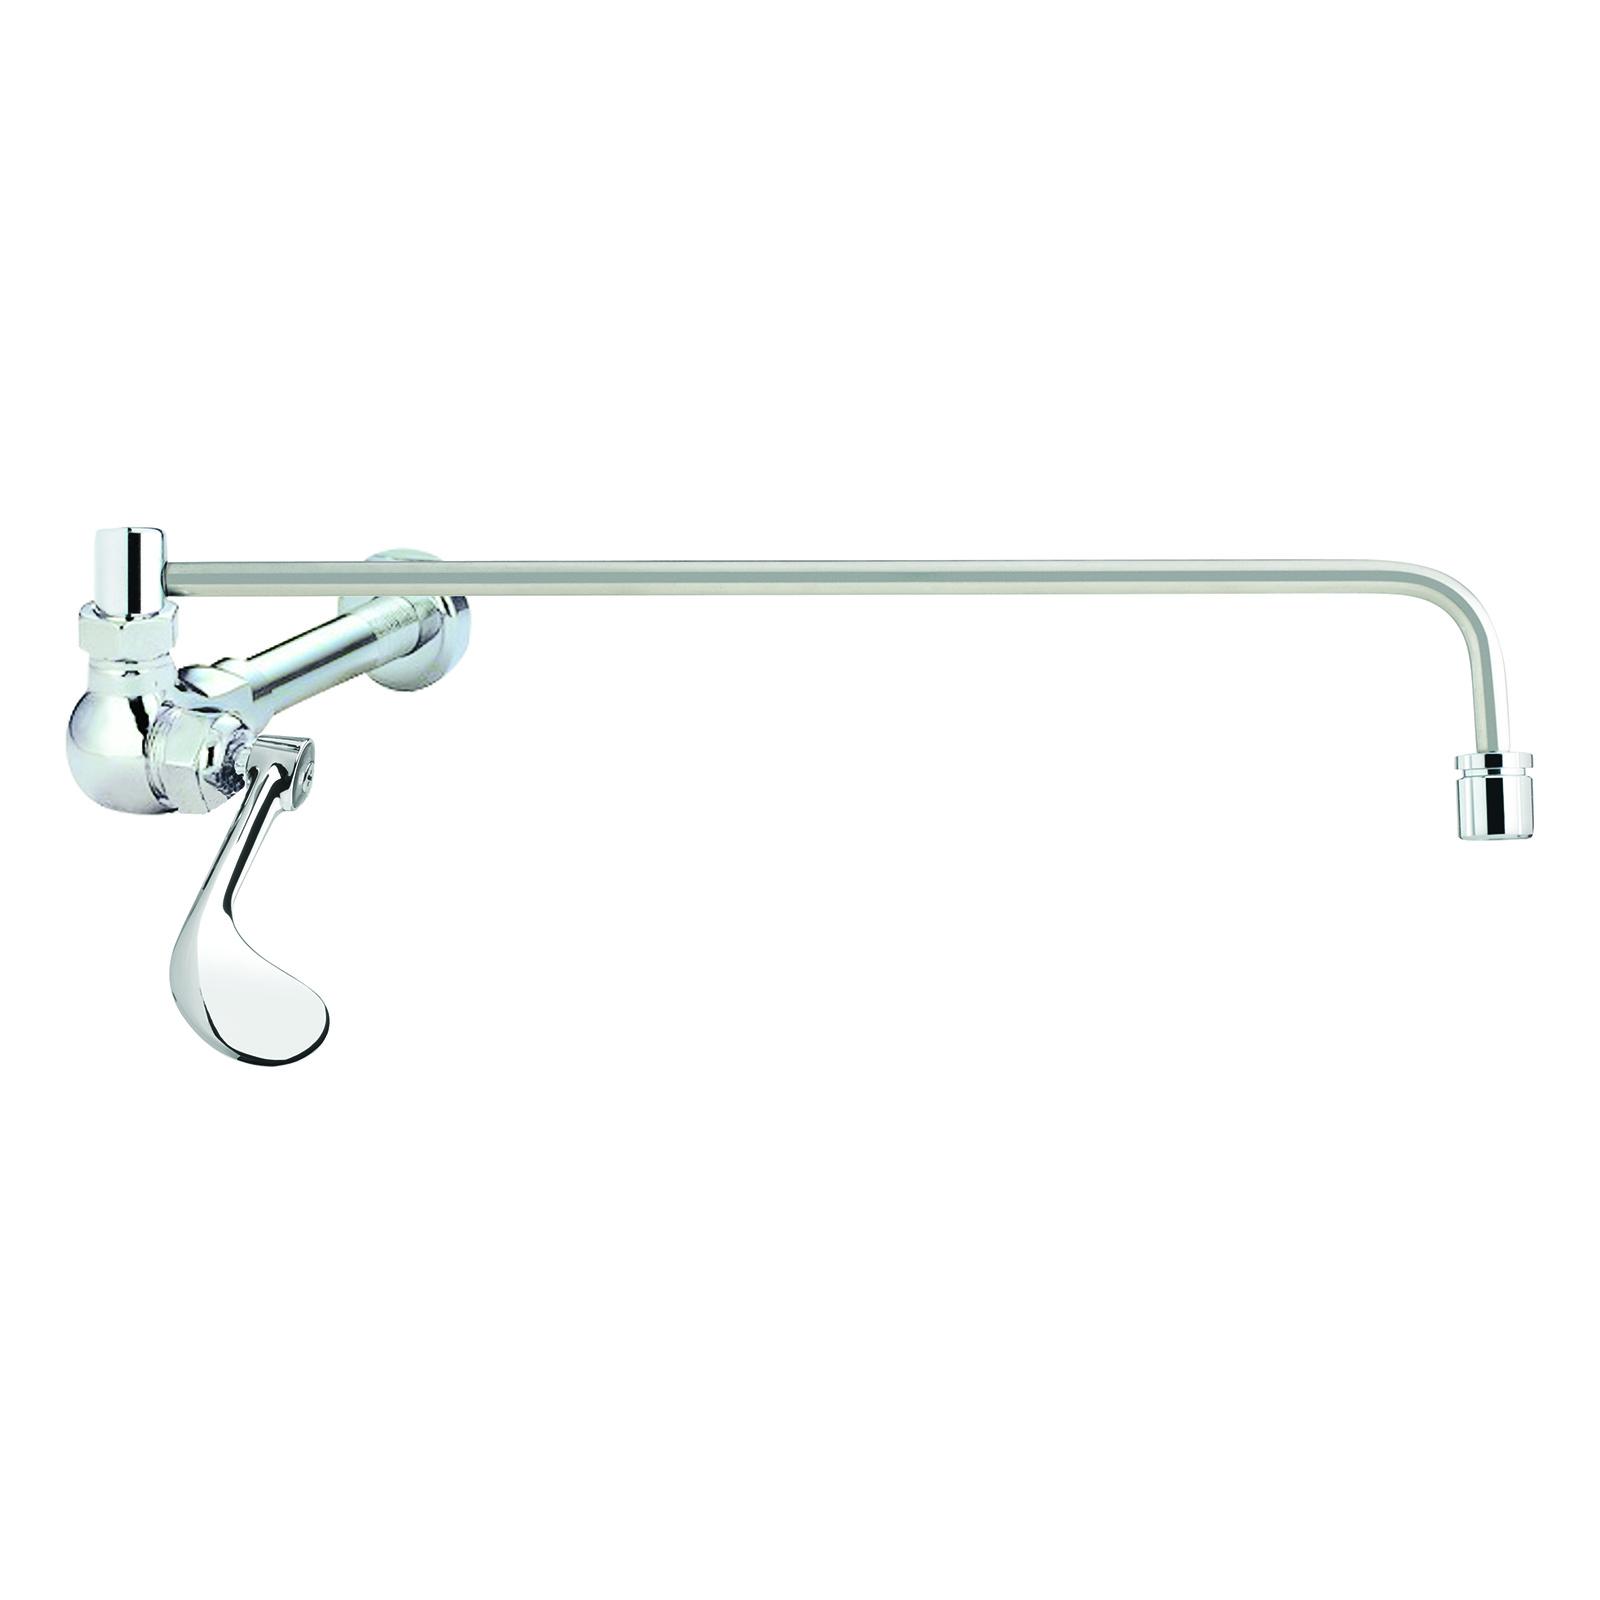 Krowne Metal 12-171L faucet, wok / range filler